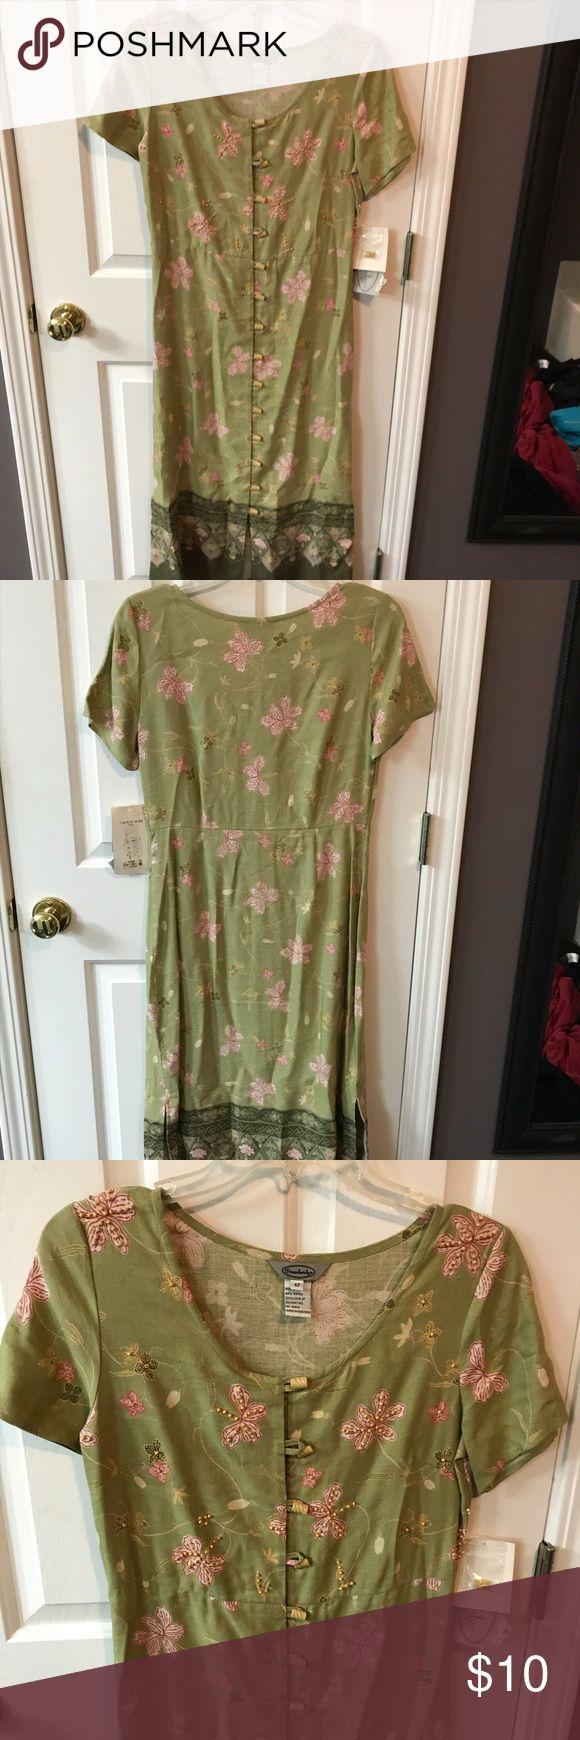 Green NWT petite dress Never worn! stonebridge Dresses Maxi